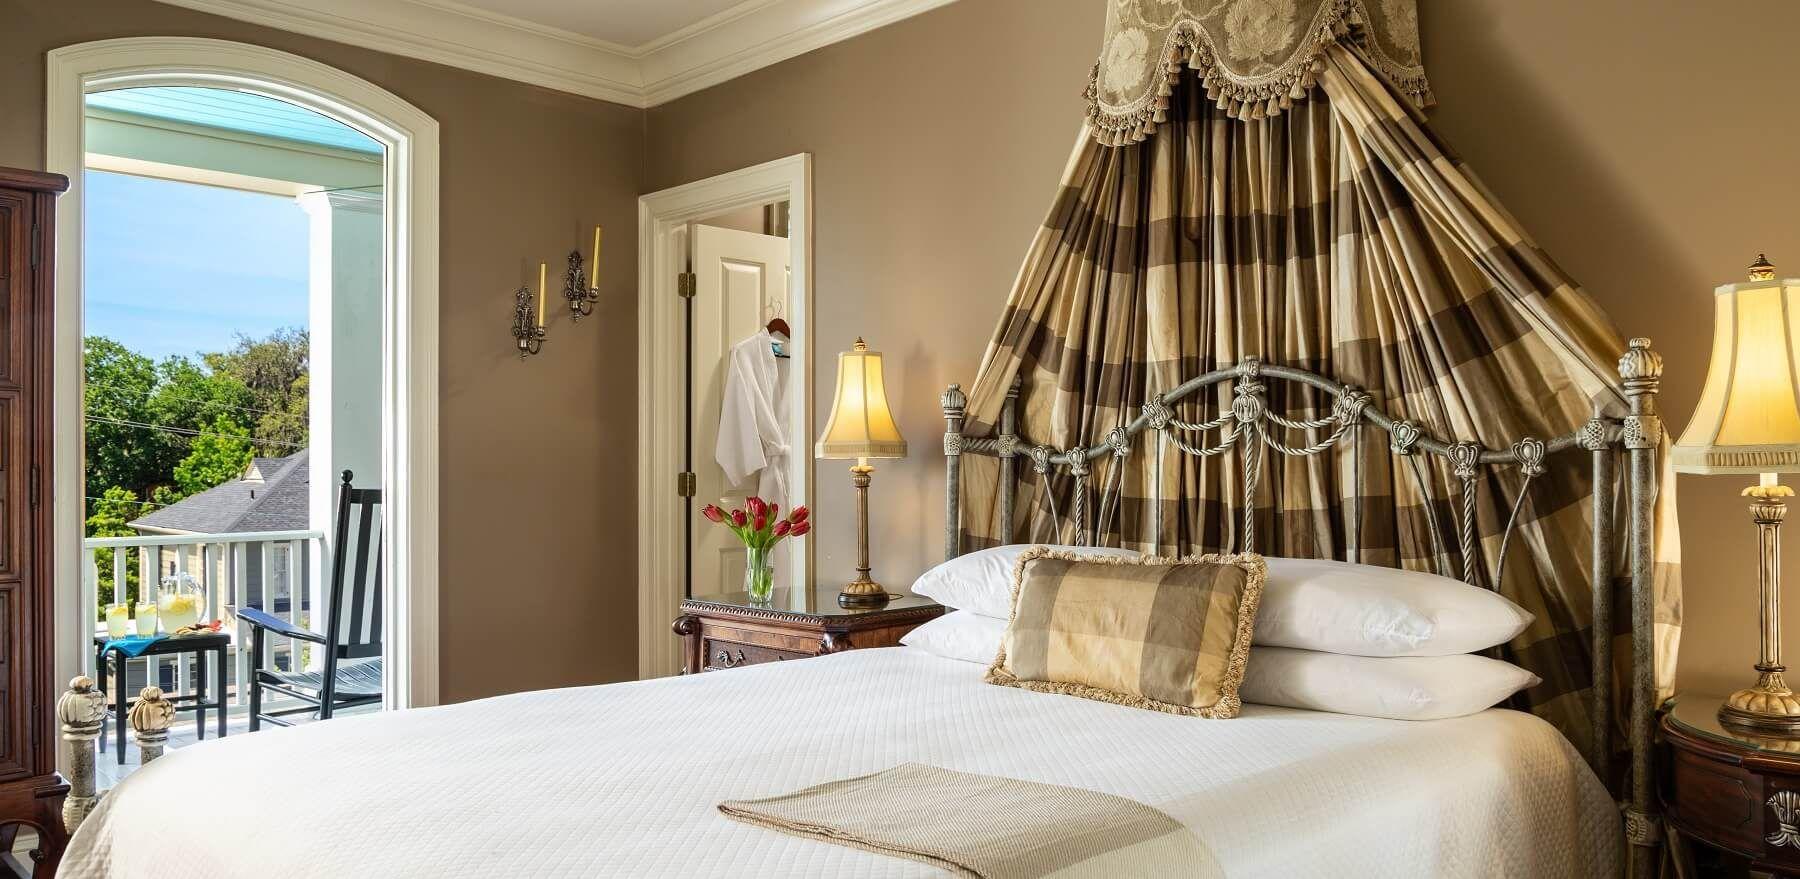 Bed & Breakfast in Savannah GA Historic District Inn on